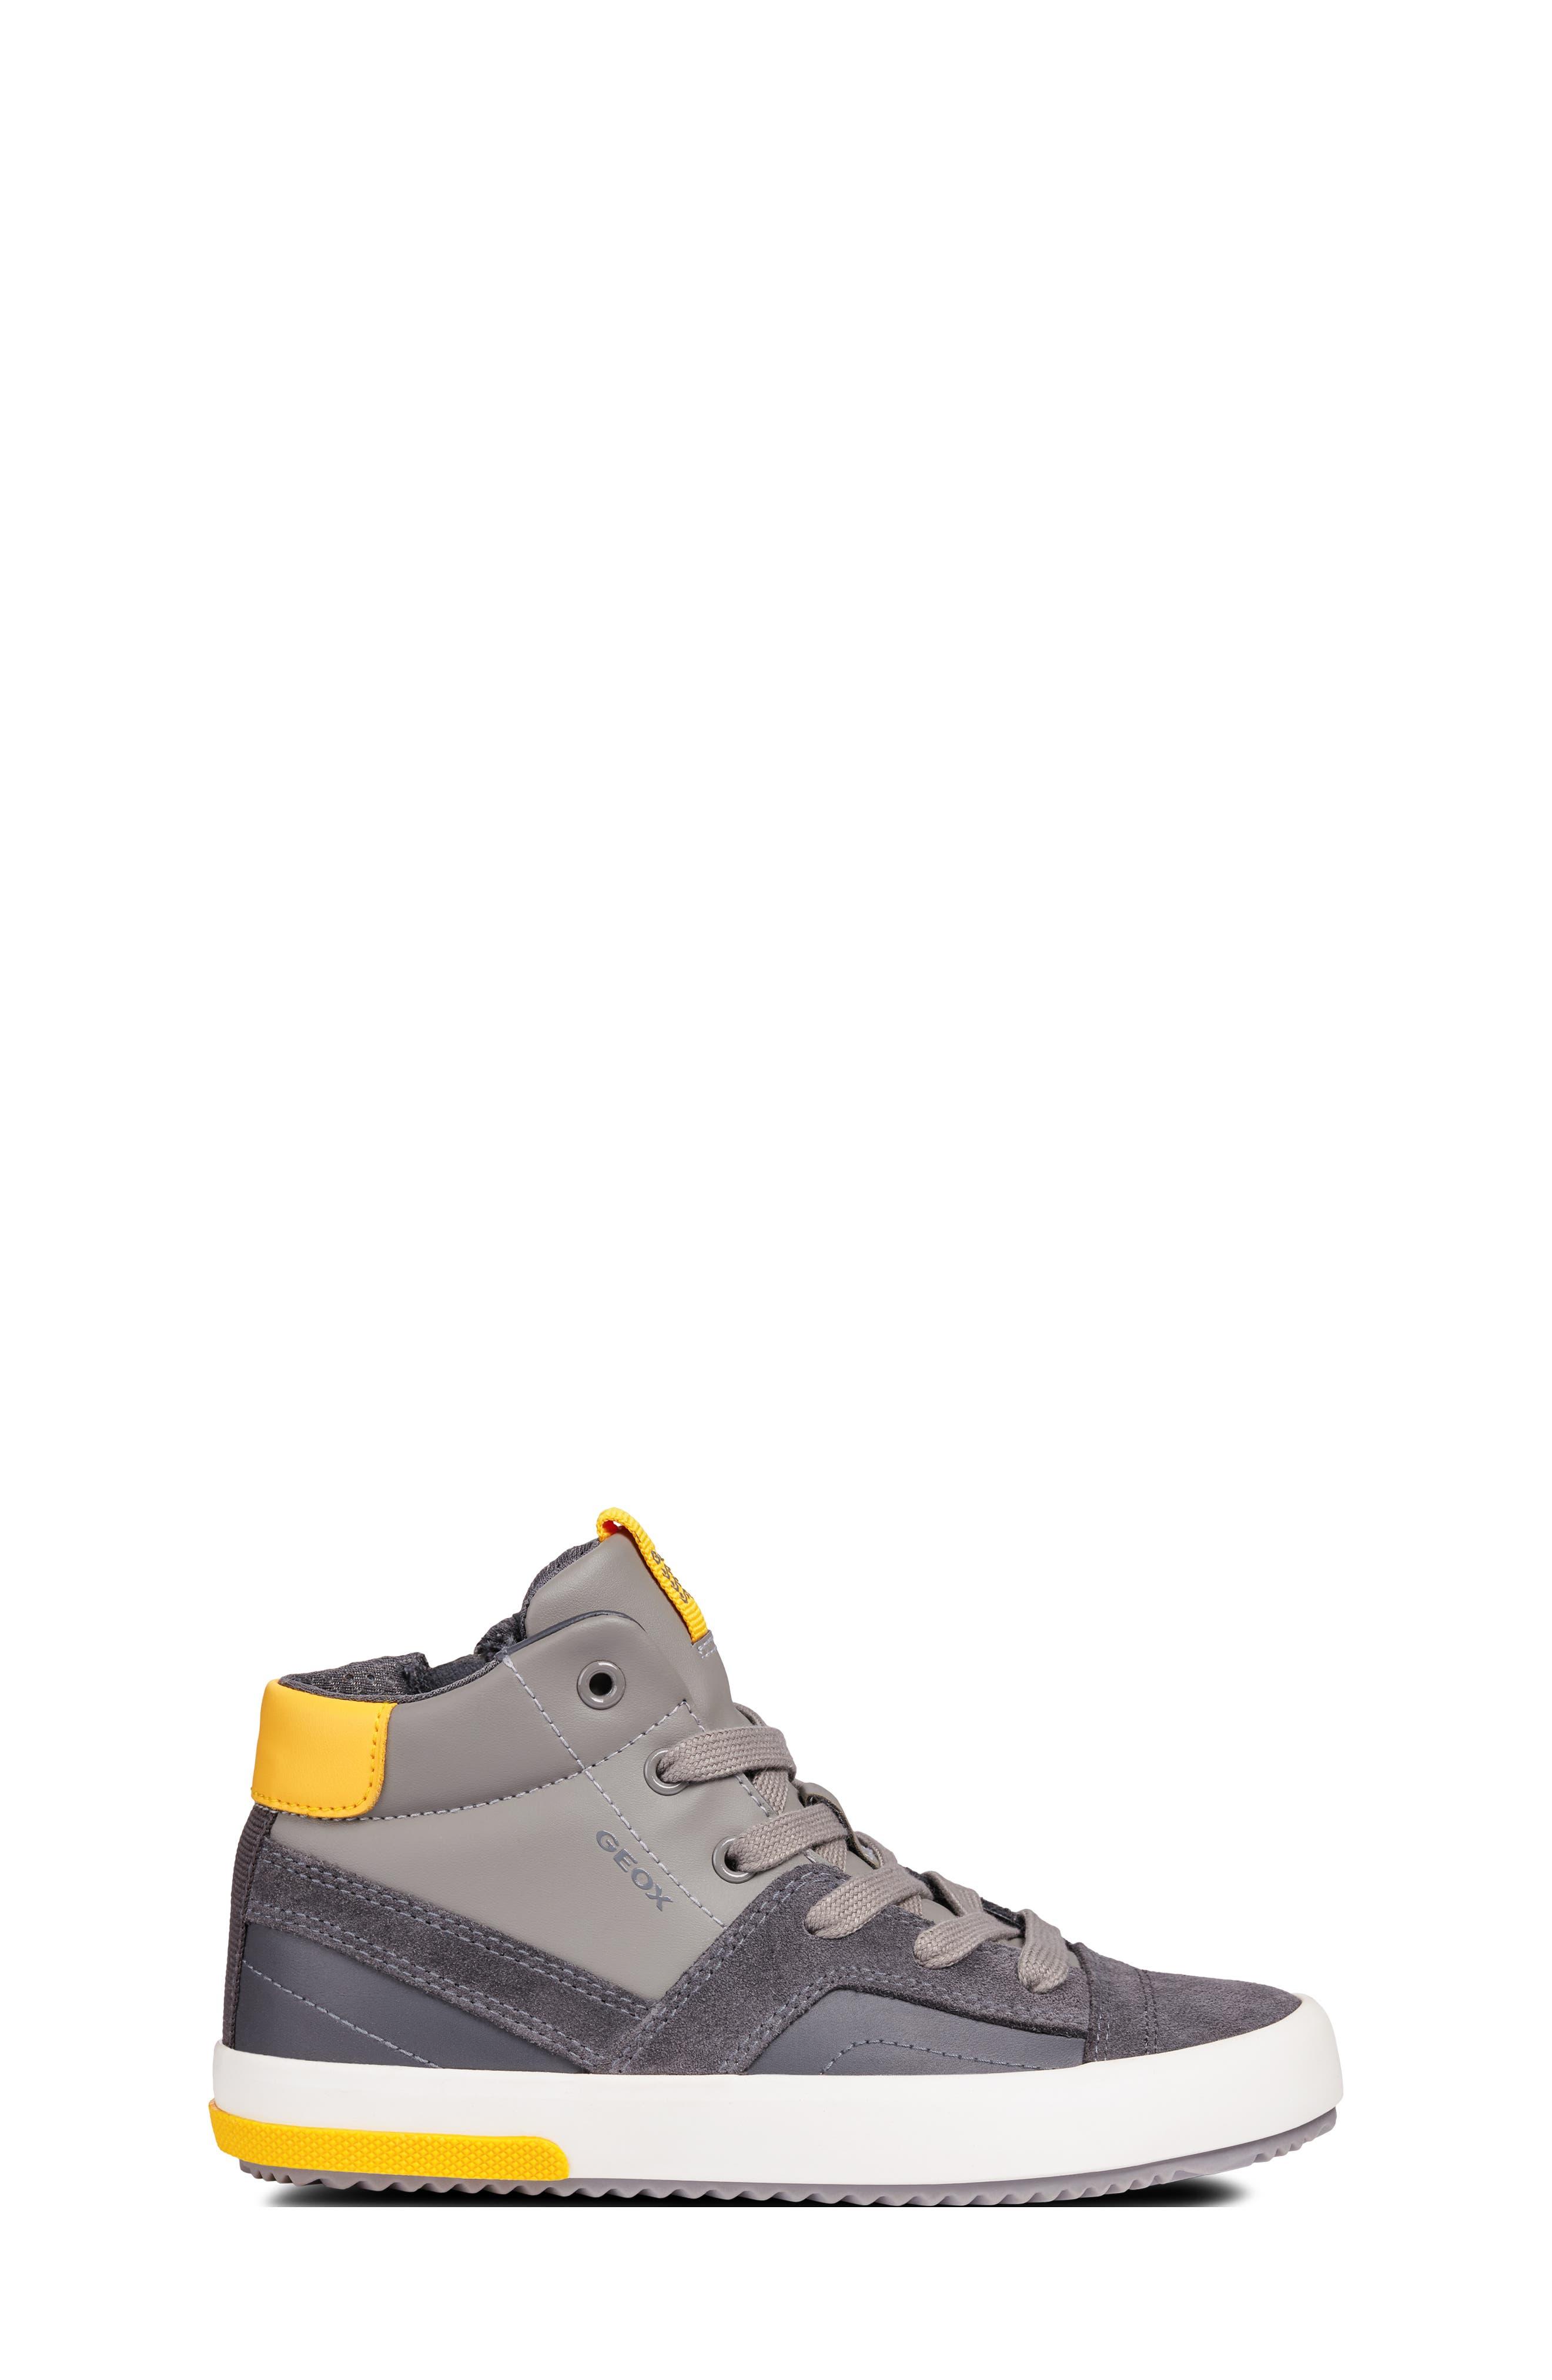 Alonisso 24 High Top Sneaker,                             Alternate thumbnail 7, color,                             DARK GREY/YELLOW